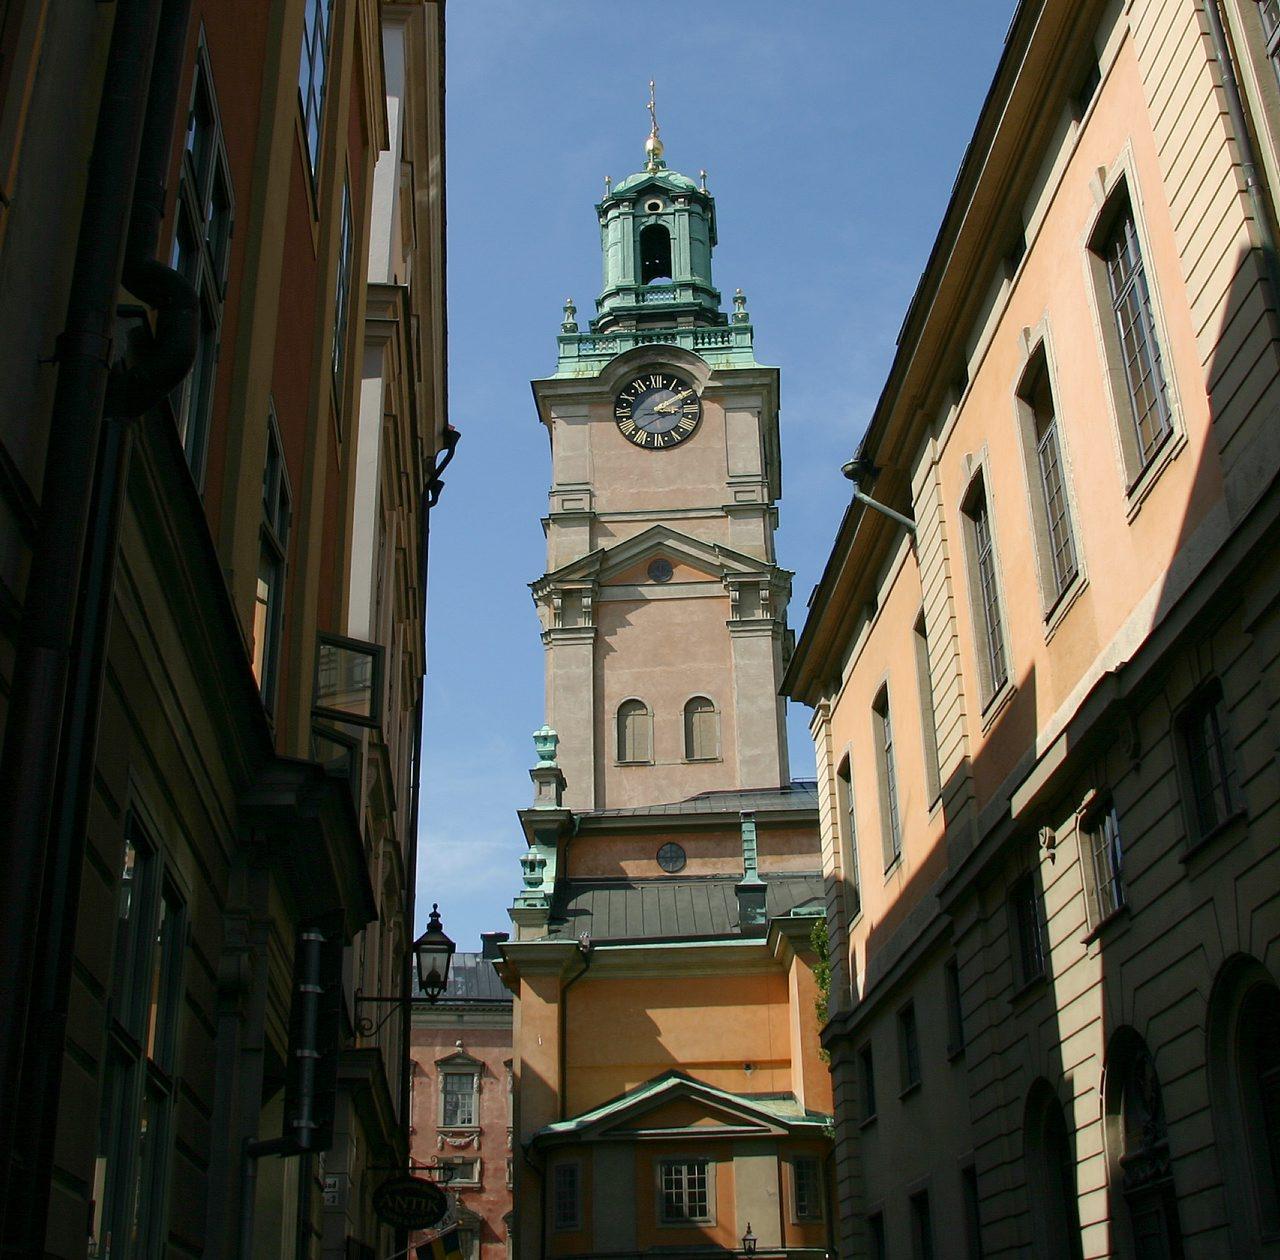 http://www.tunliweb.no/Bilder_SM/_album_stockholm/f2.jpg